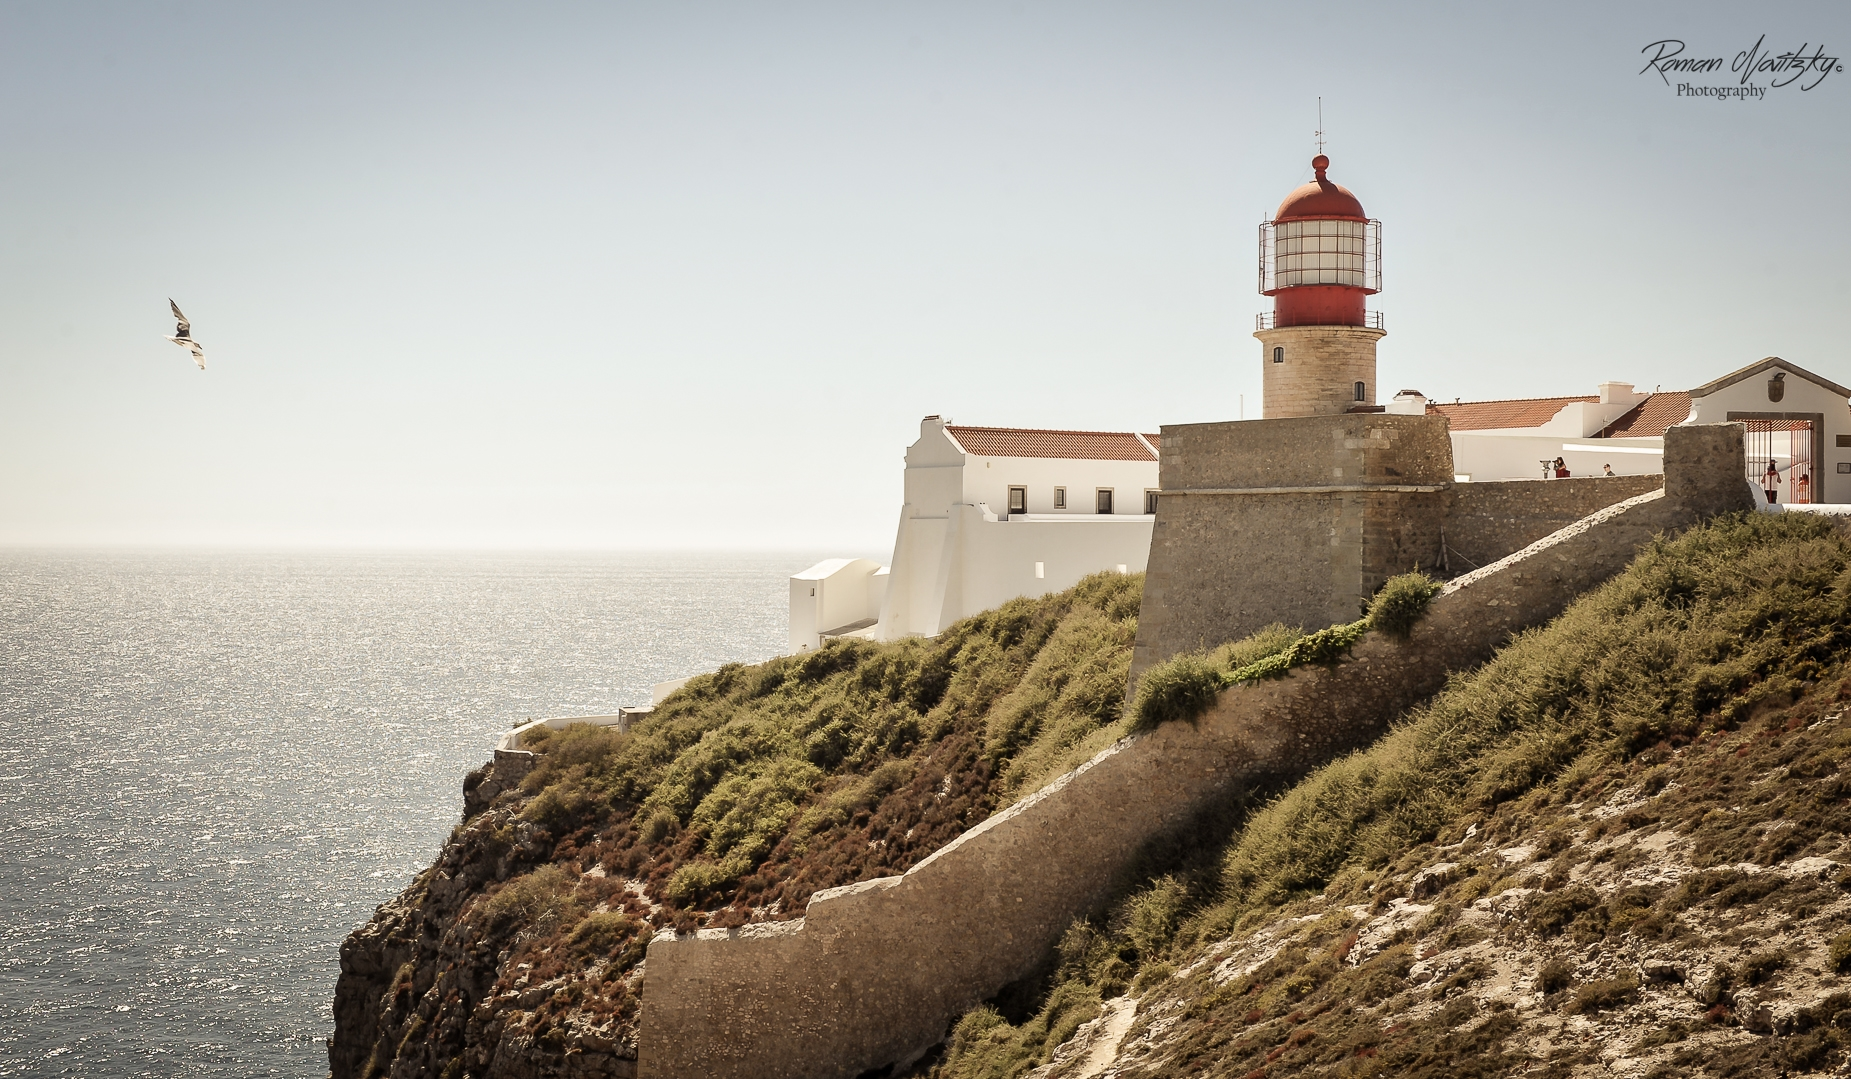 Last hot dog before America...Portugal - Algarve - Sagres